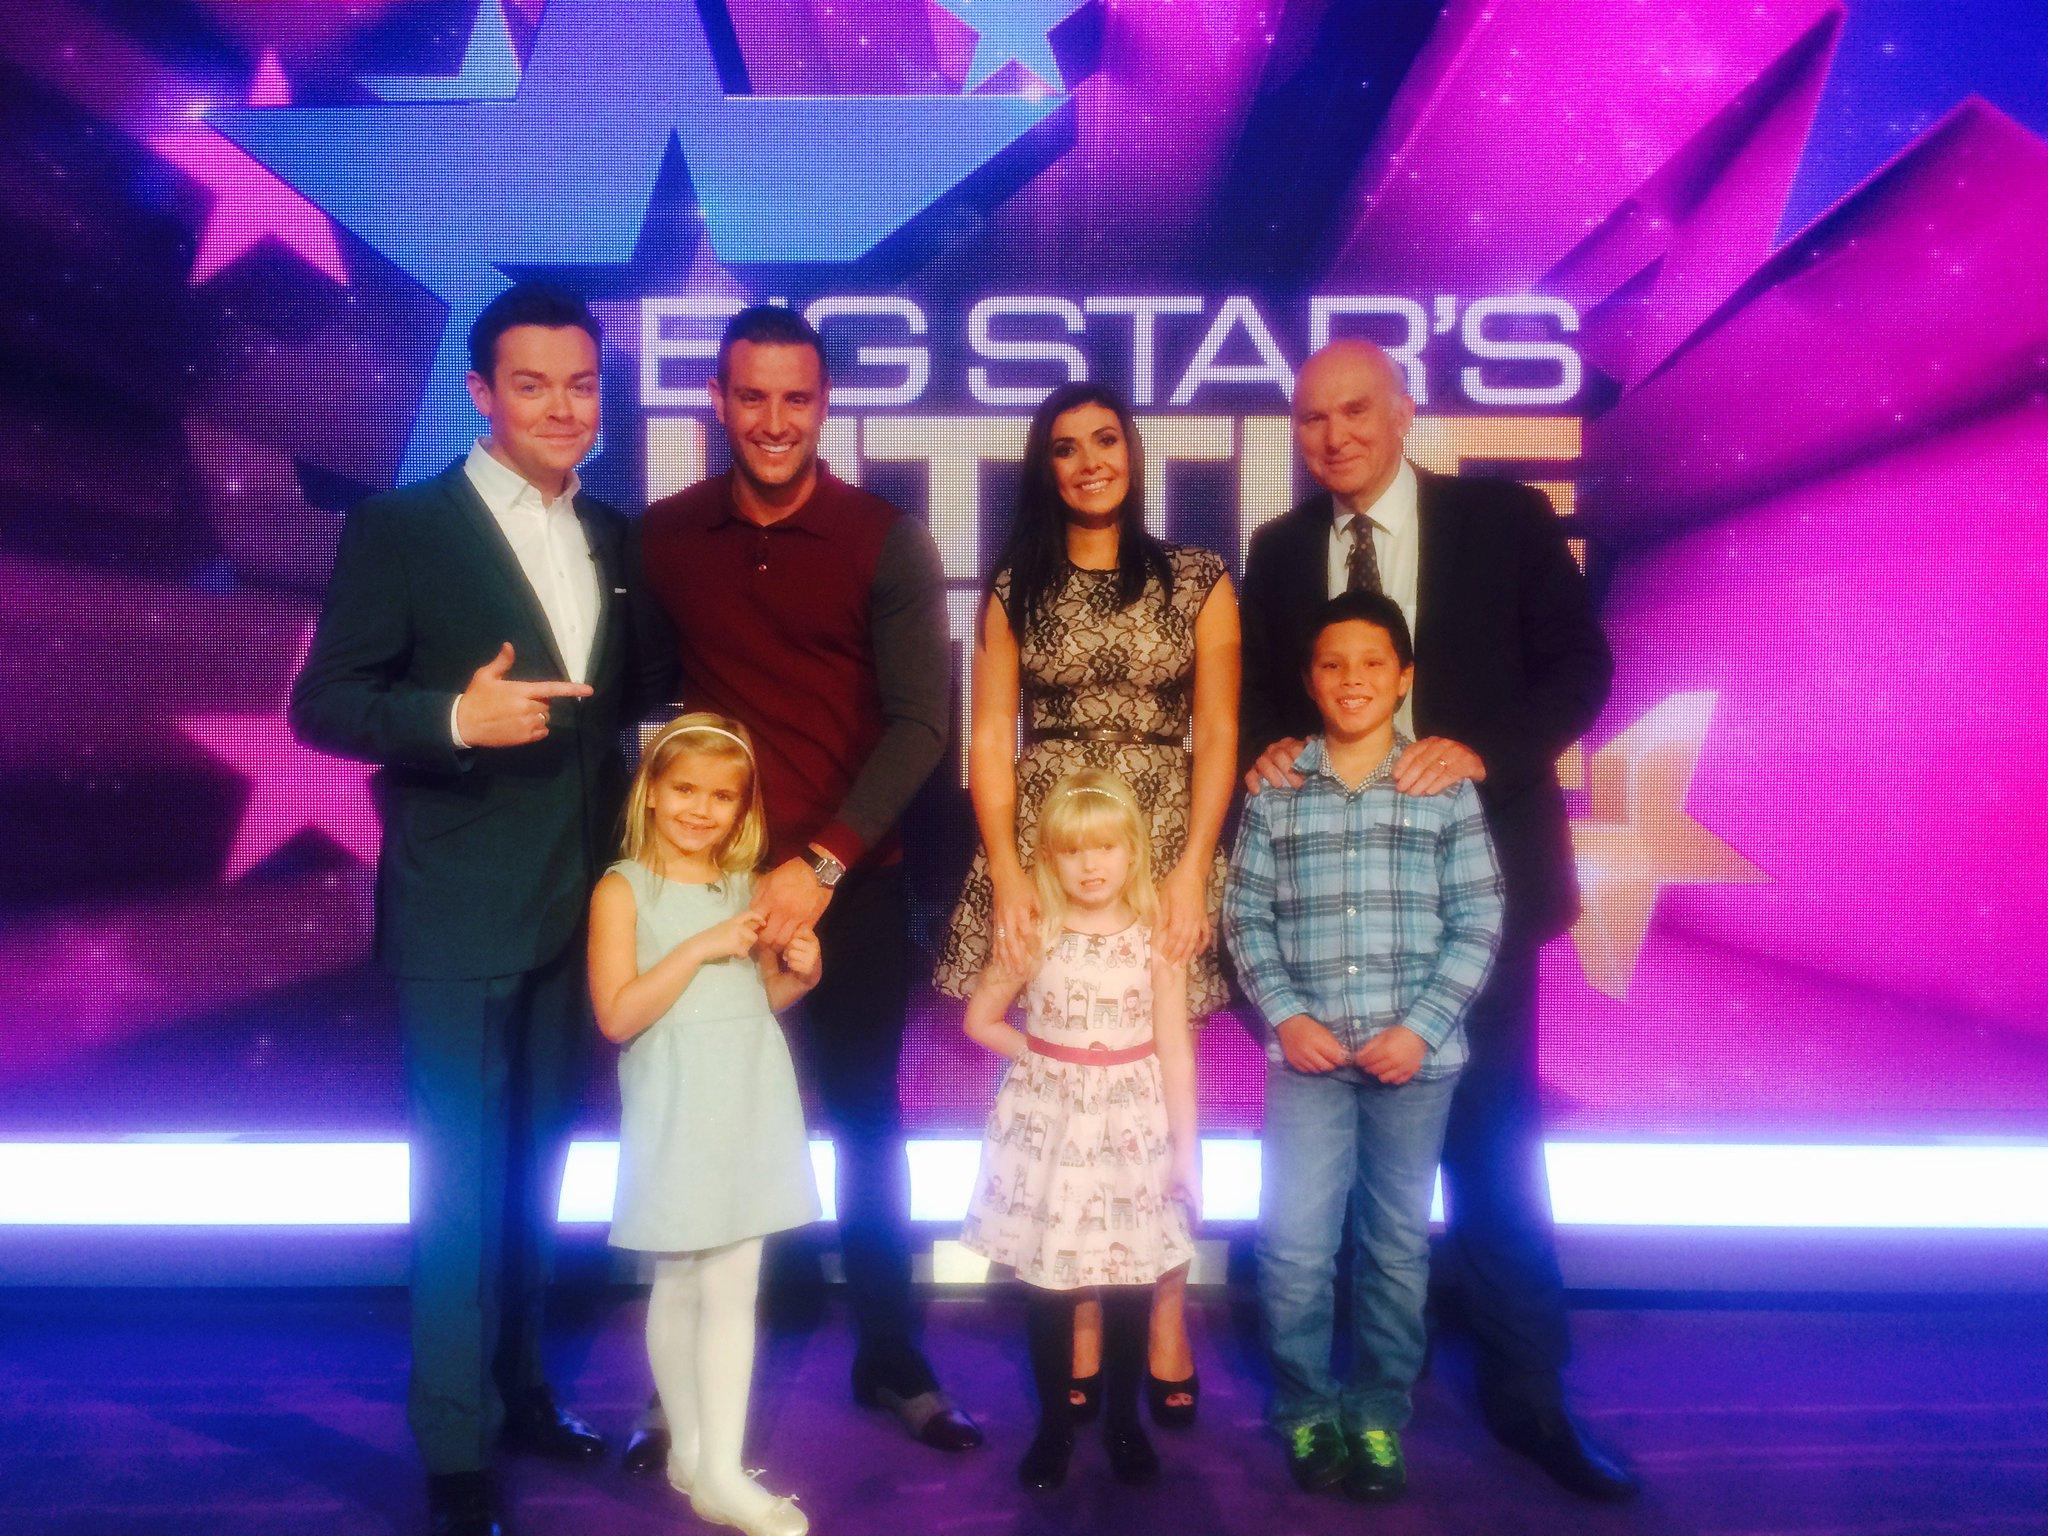 RT @ITVBigStars: Brand new #BigStarsLittleStar with @msm4rsh, @elliottwright_ & @vincecable joining @StephenMulhern 8pm Wed @ITV! https://t…